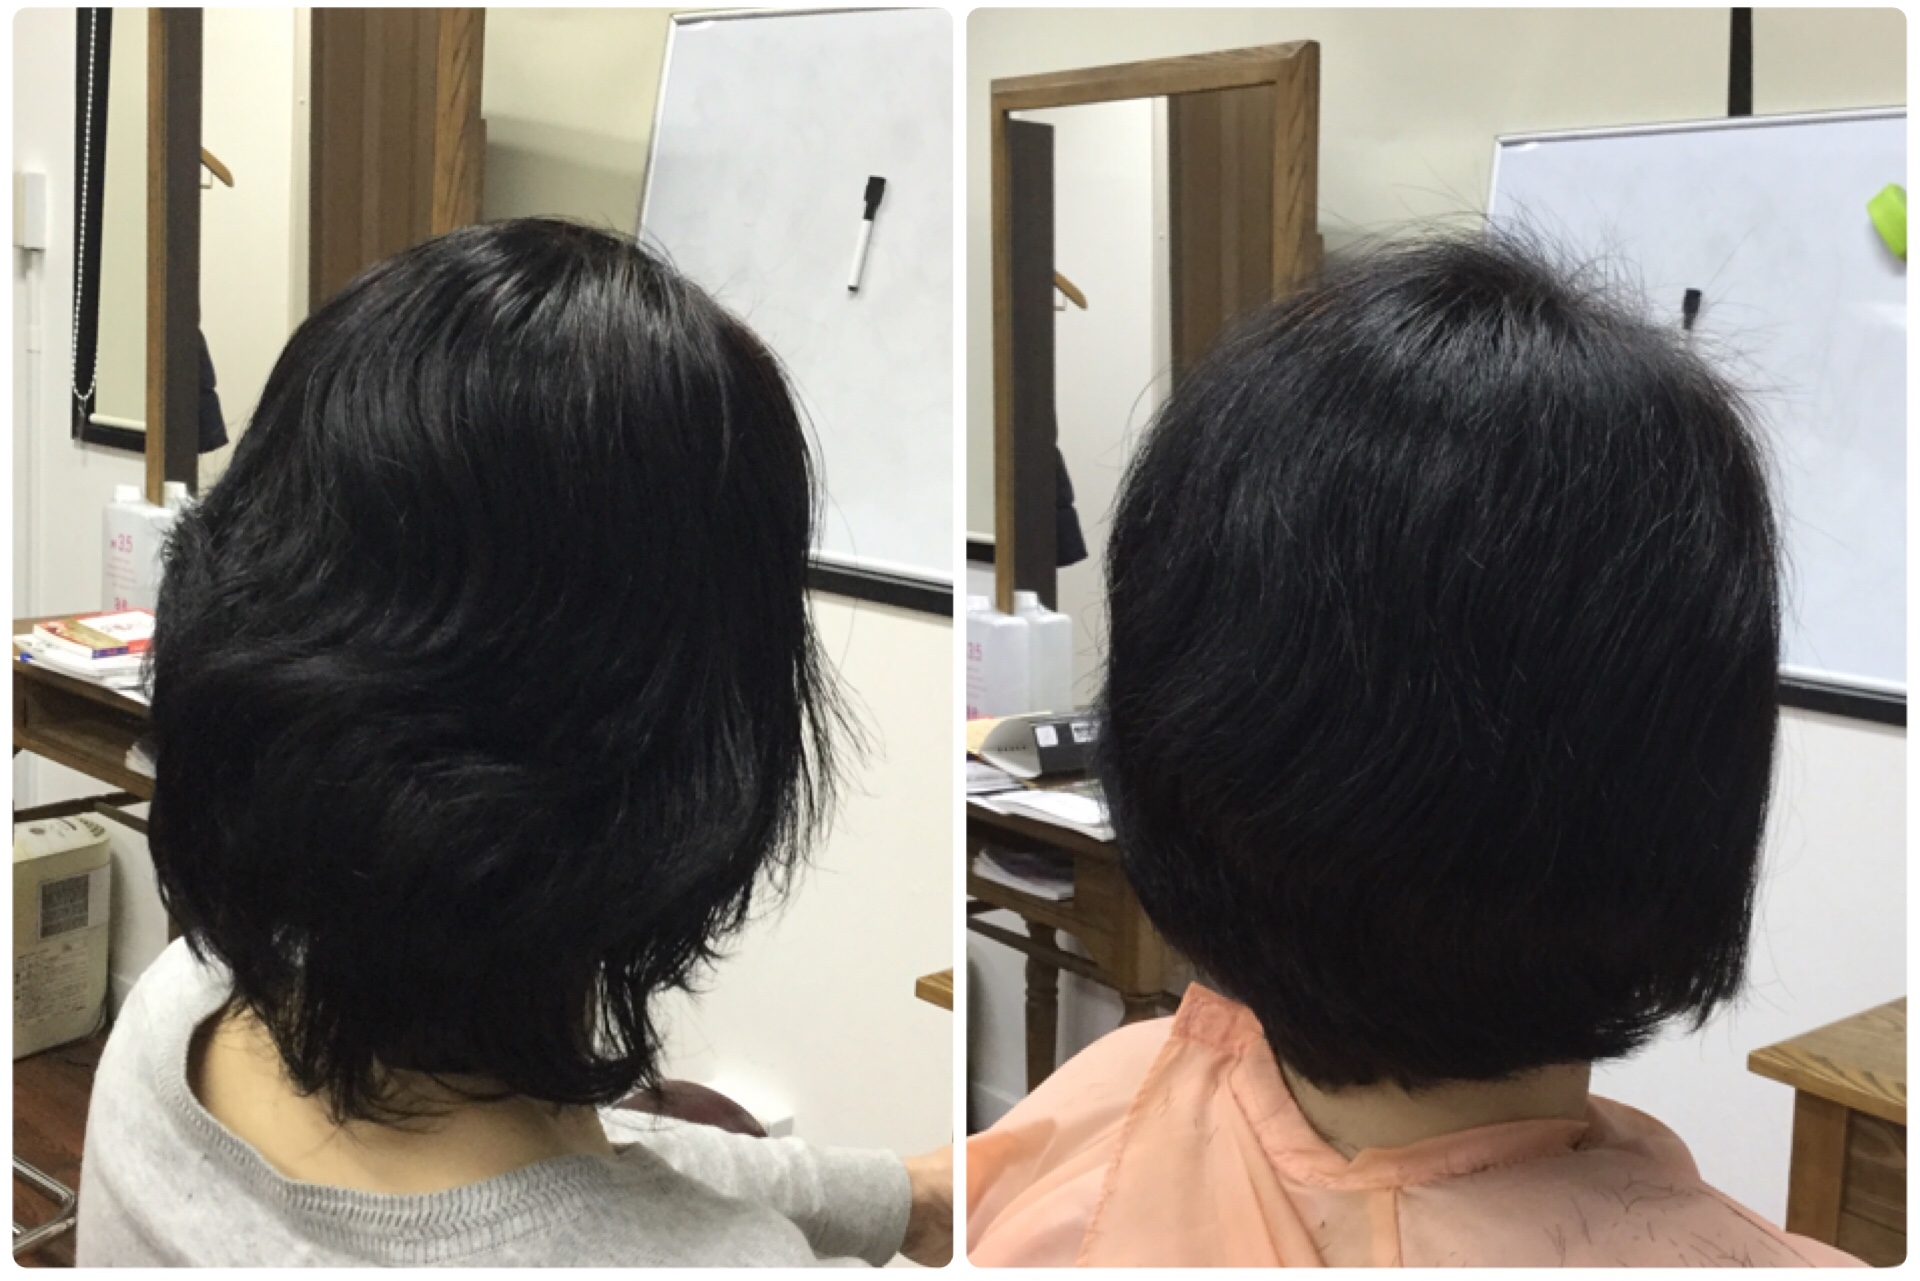 I神戸でくせ毛でお困りなら【すきハサミを使わない骨格補正くせ毛カット】の神戸くせ毛専門美容室アバディ